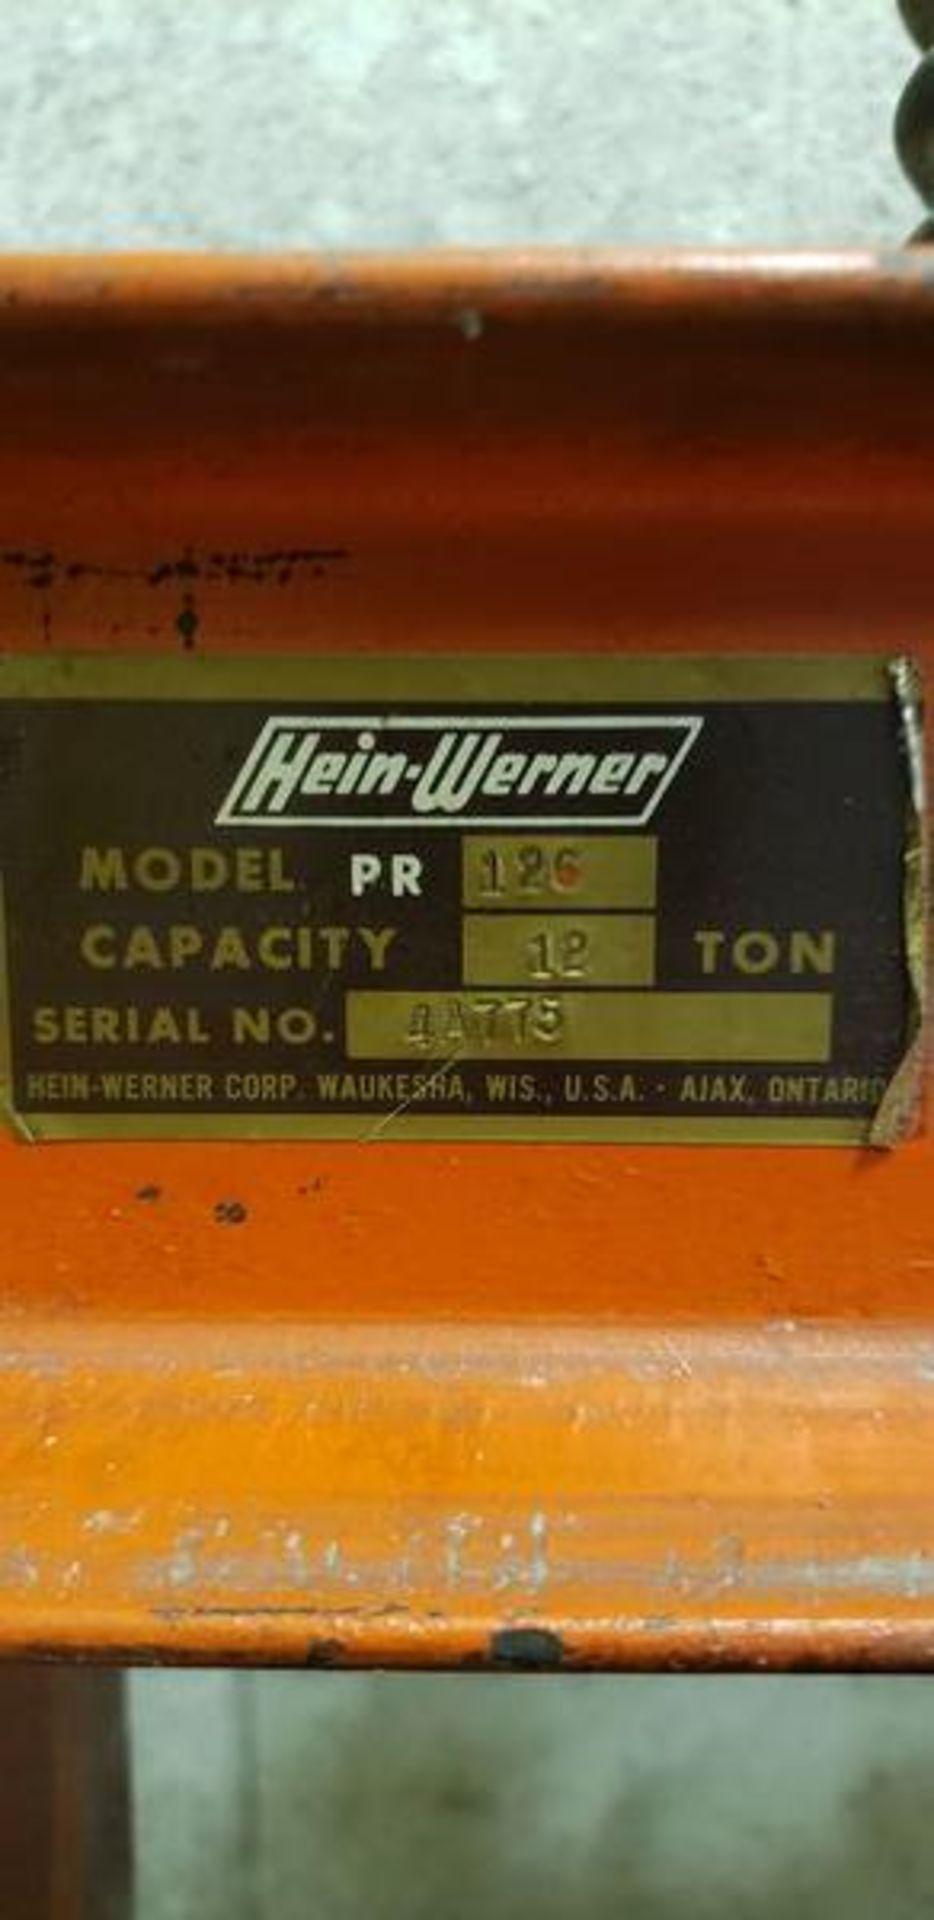 HEIN WERNER PRESS MODEL PR126 - 12 TON CAP - Image 6 of 6